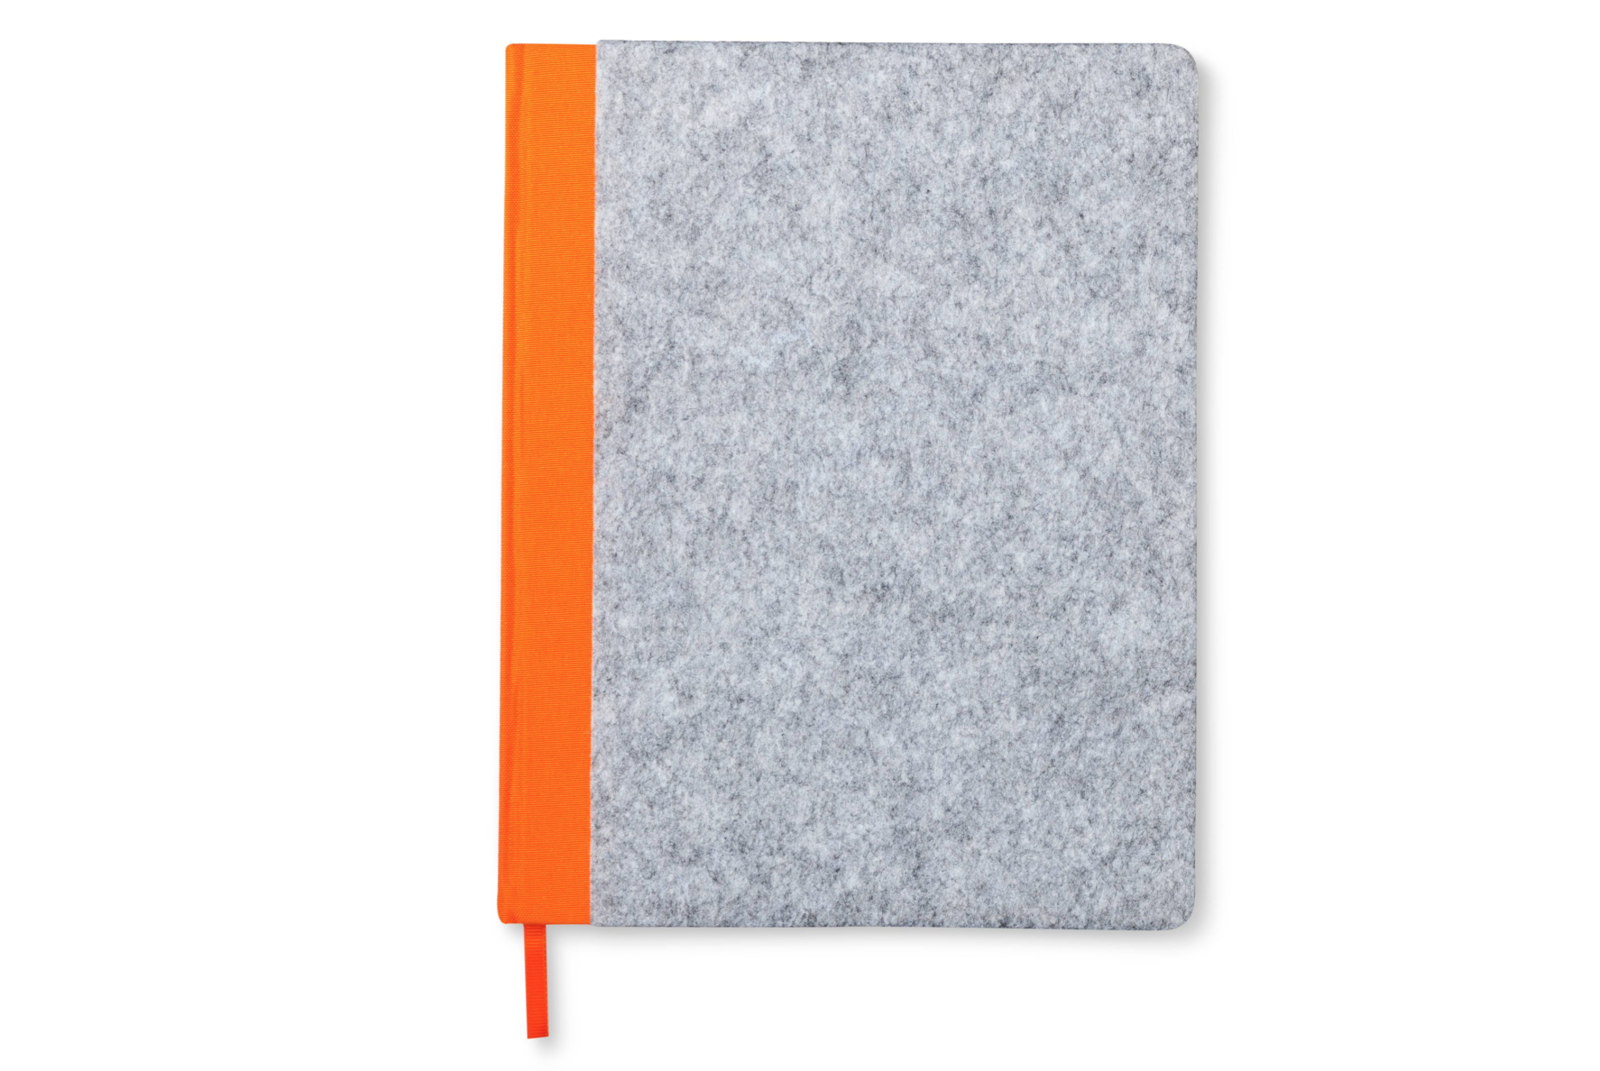 Photo 1 of 1 in Modern by Dwell Magazine Orange Felt Notebook